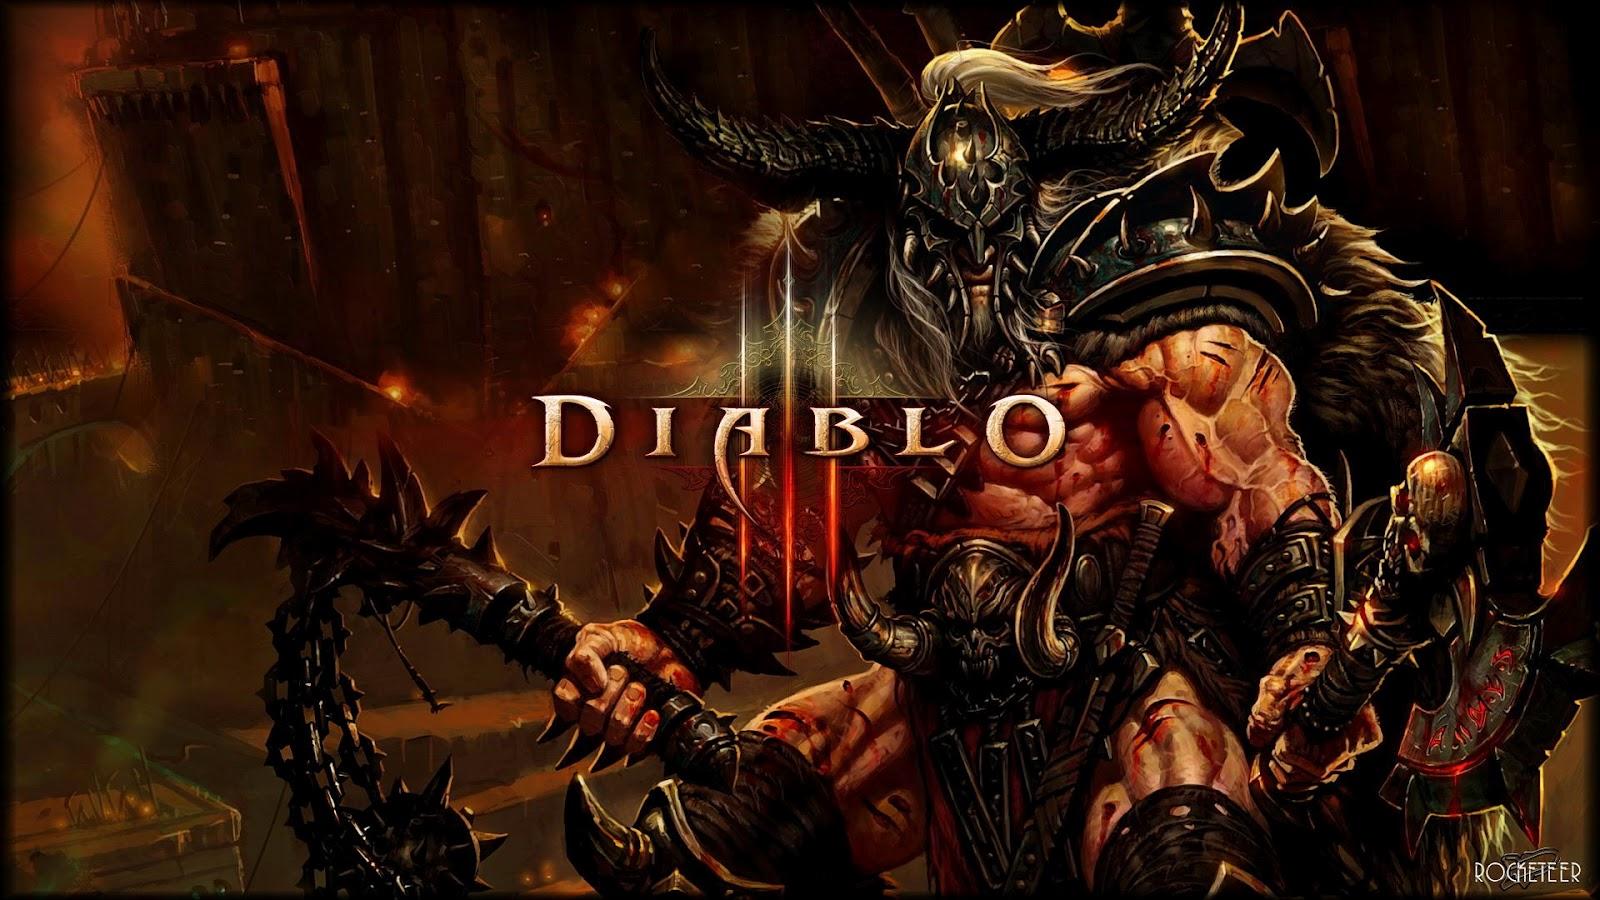 http://4.bp.blogspot.com/-e9uceWF6SUs/T7EmgOpxIvI/AAAAAAAAAV0/VQO__3YMT9k/s1600/Diablo-3-Wallpaper-HD-Game-HD.jpg